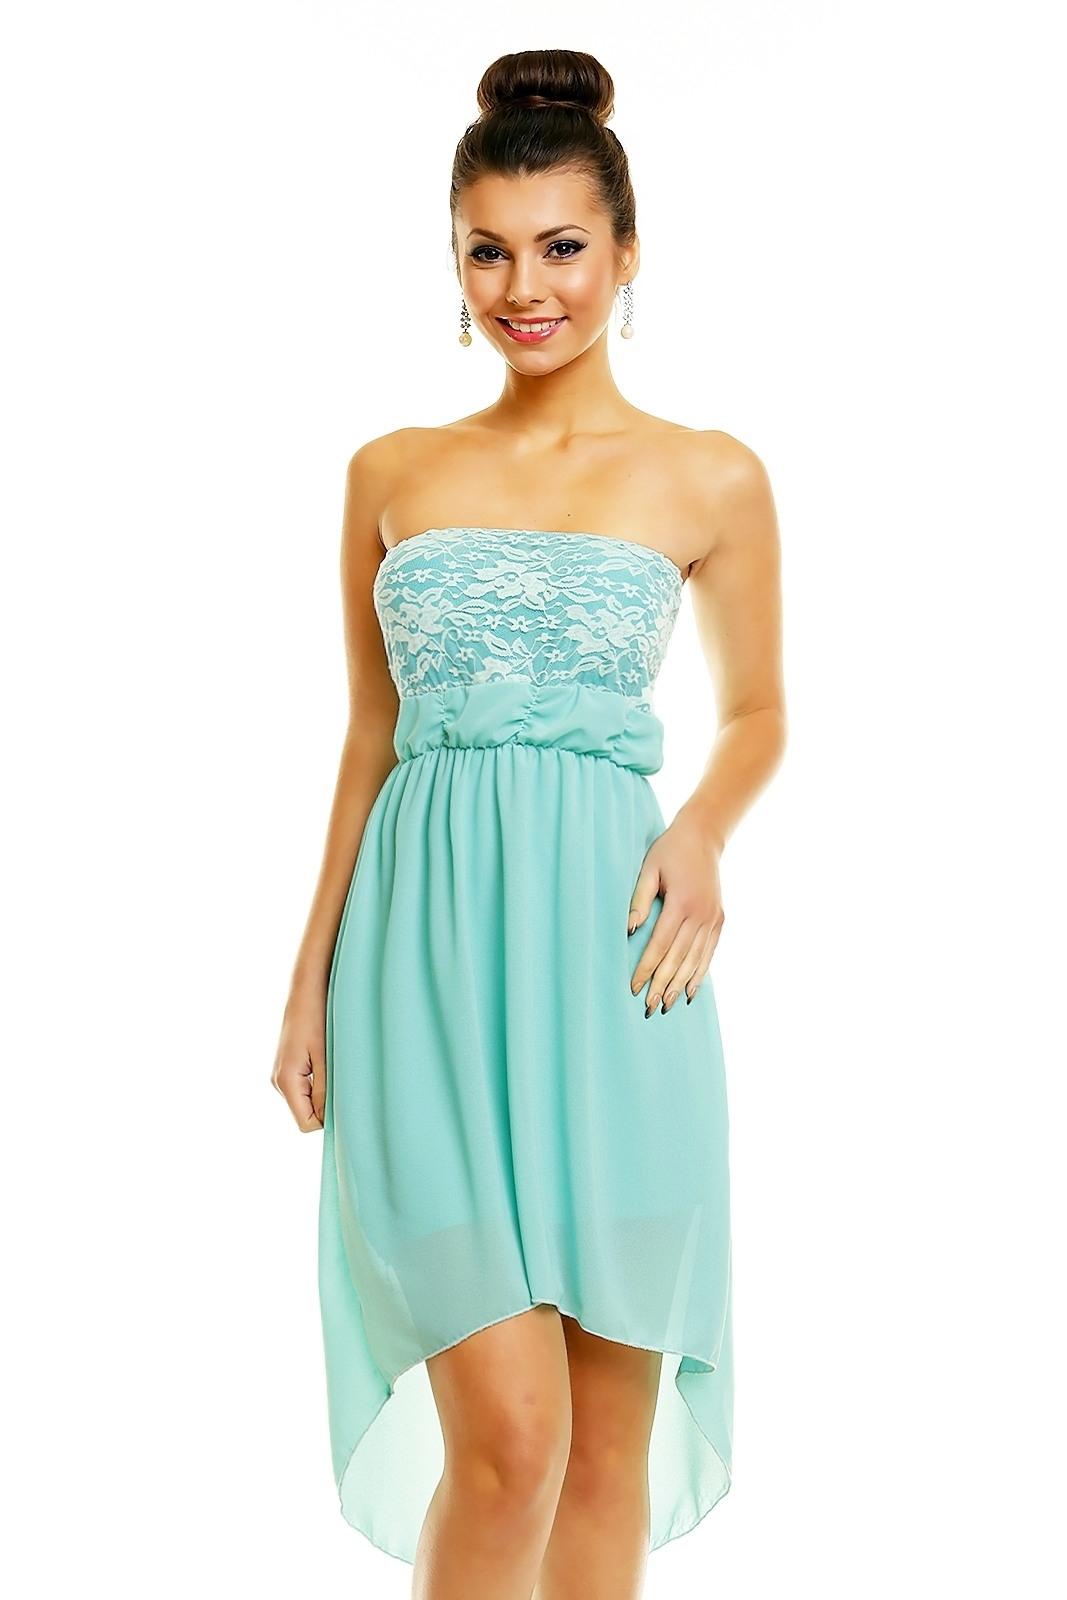 Abend Perfekt Kleid Türkis Blau ÄrmelFormal Spektakulär Kleid Türkis Blau für 2019